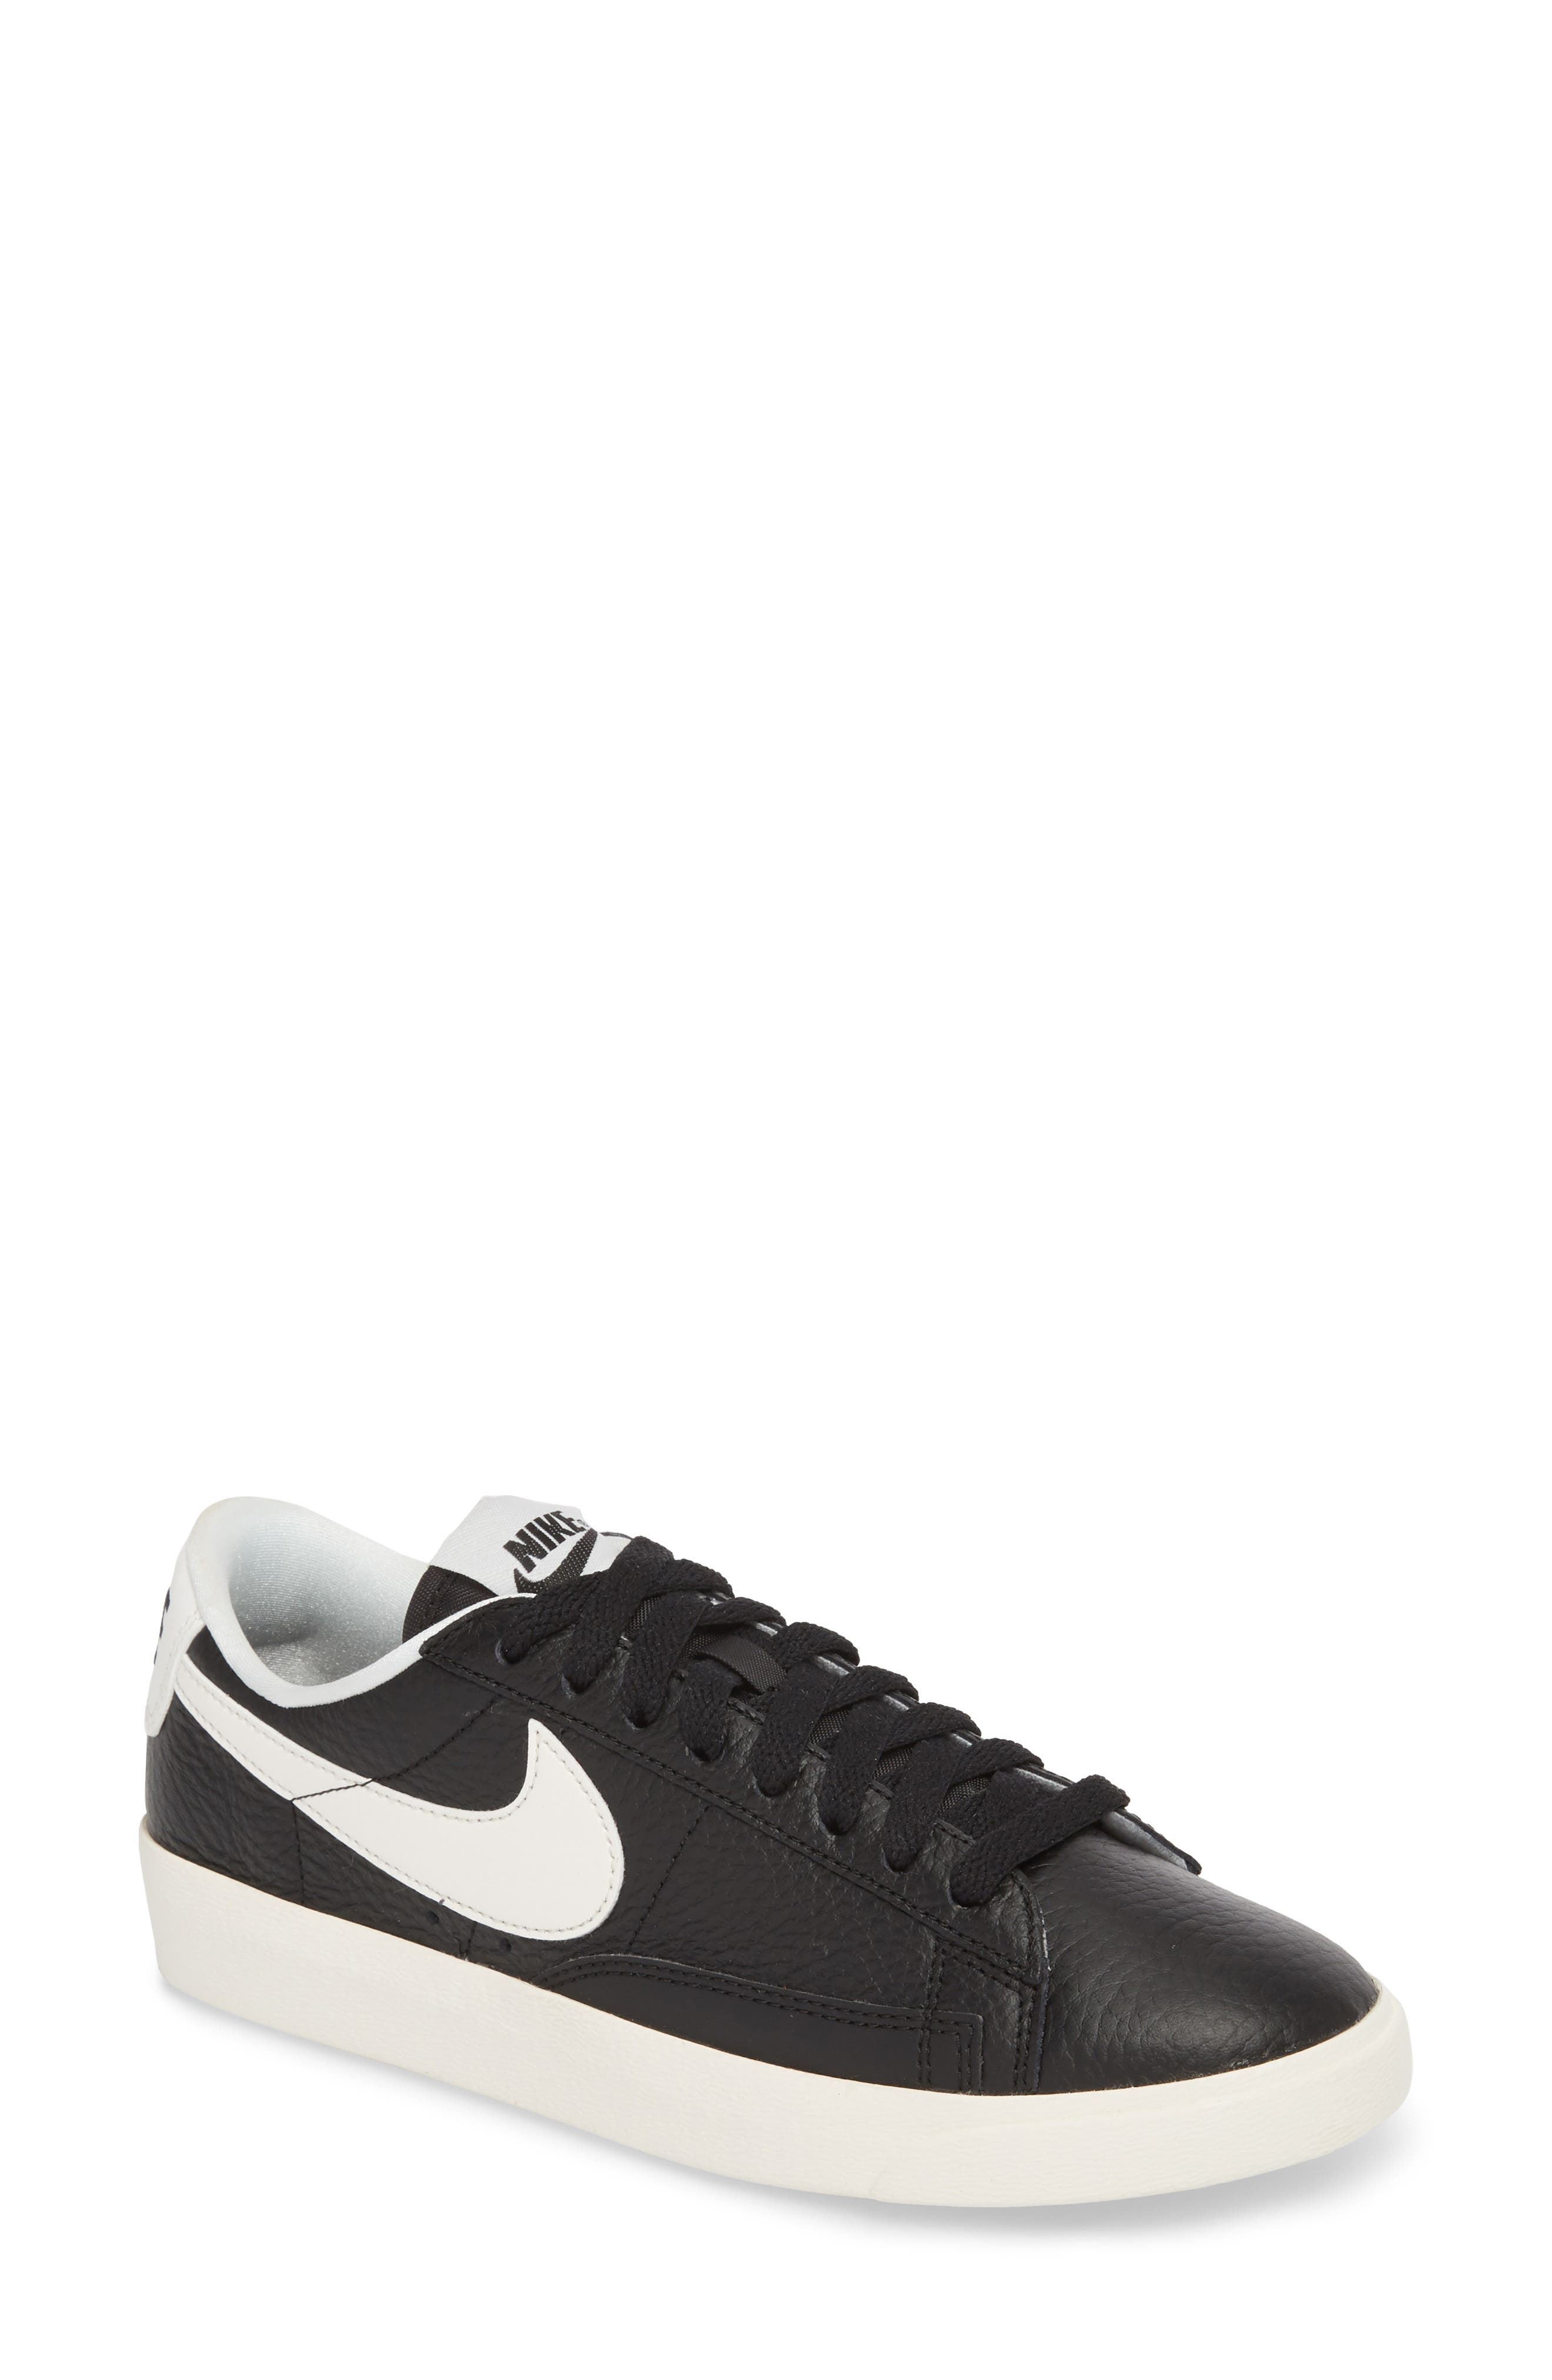 Blazer Premium Low Sneaker,                             Main thumbnail 1, color,                             BLACK/ WHITE/ BLACK